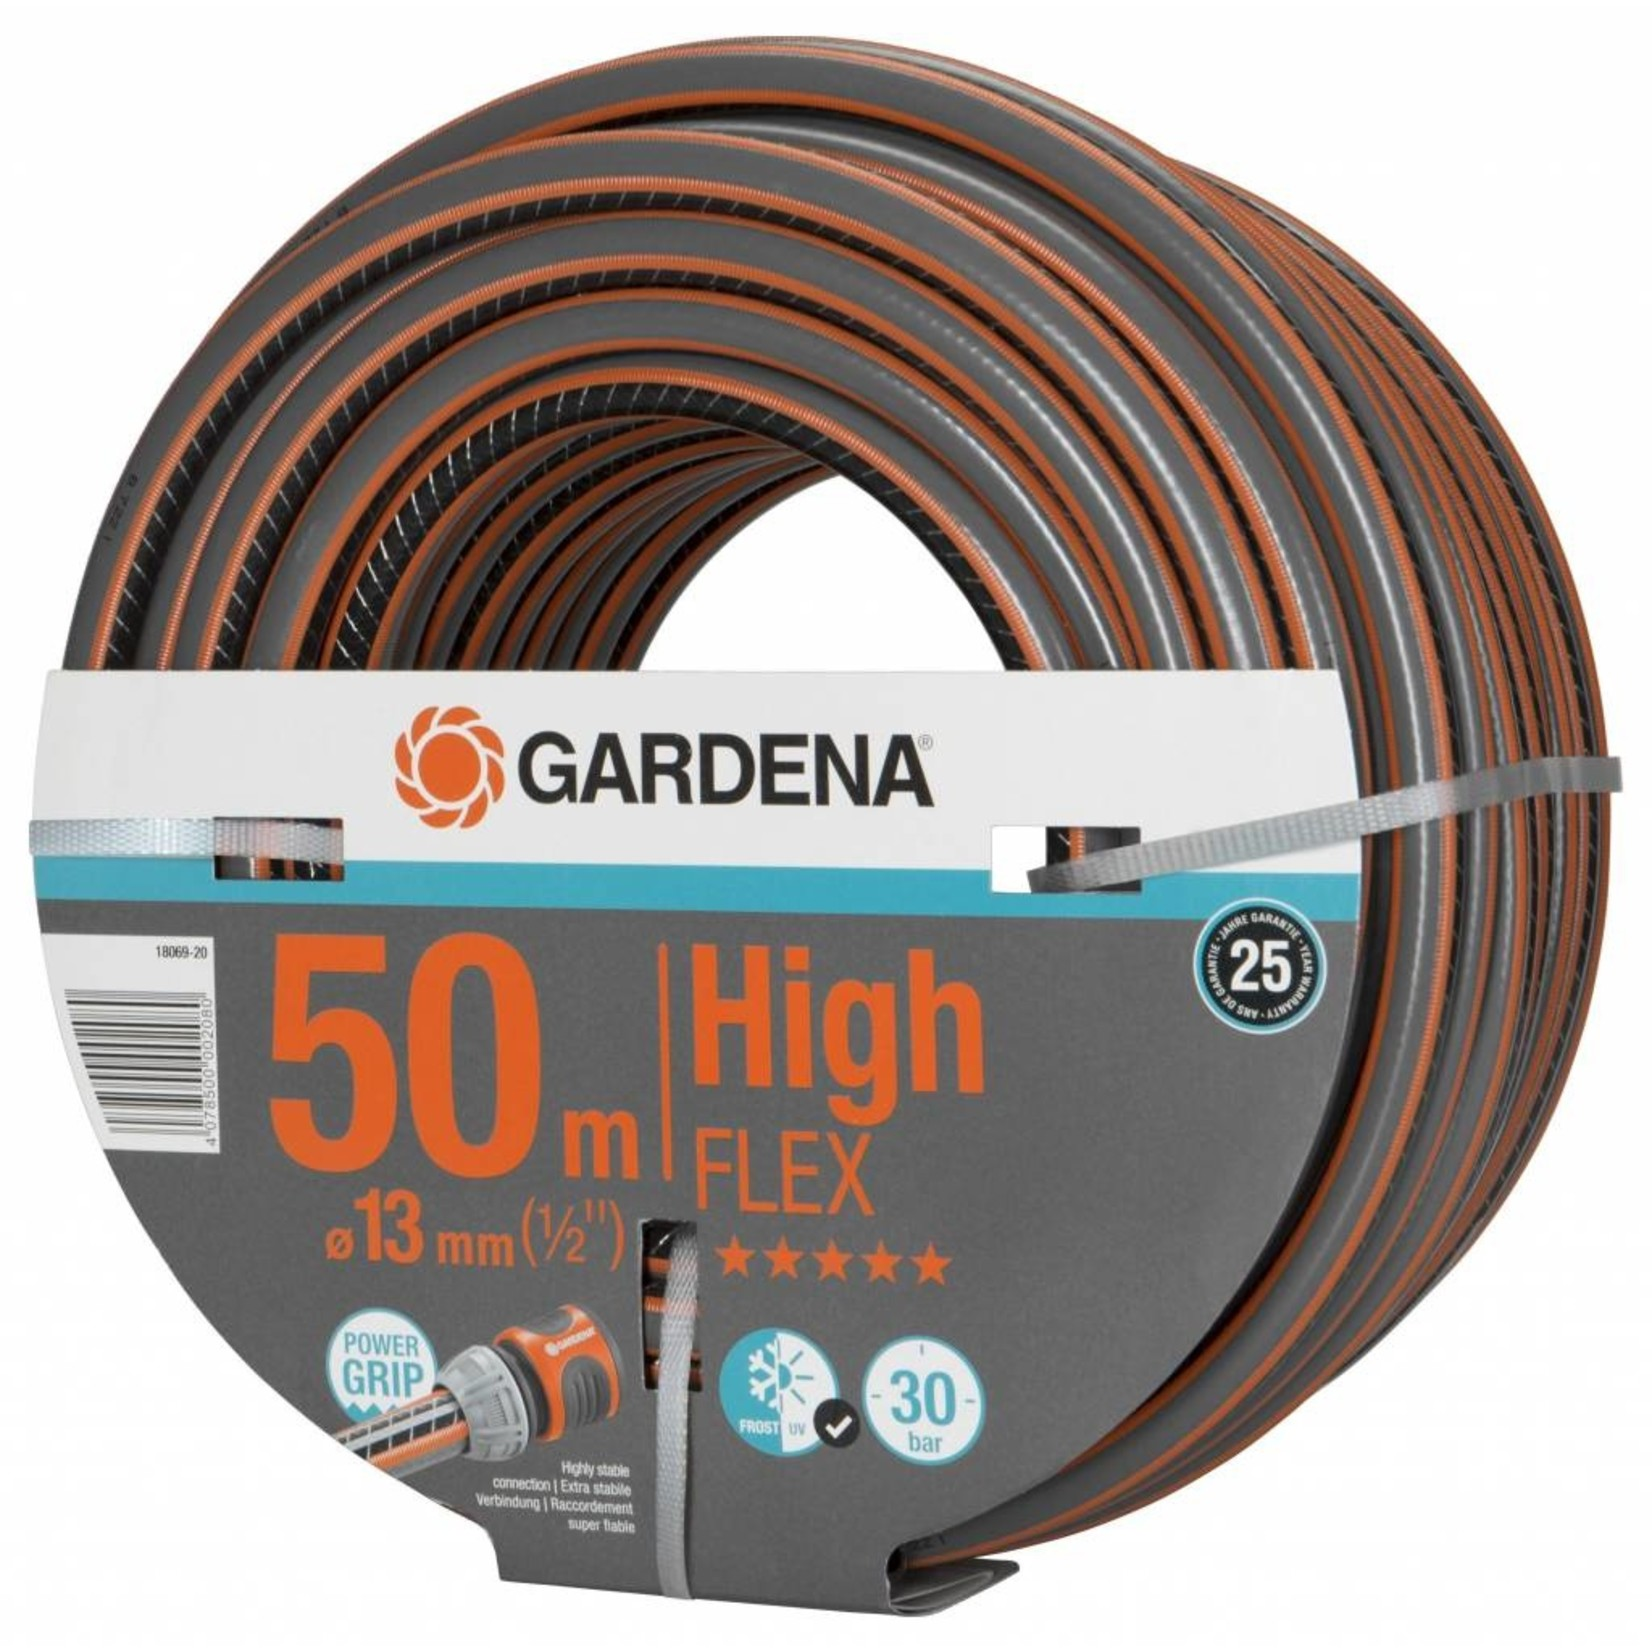 Gardena Gardena Comfort HighFLEX Slang 50m/13mm